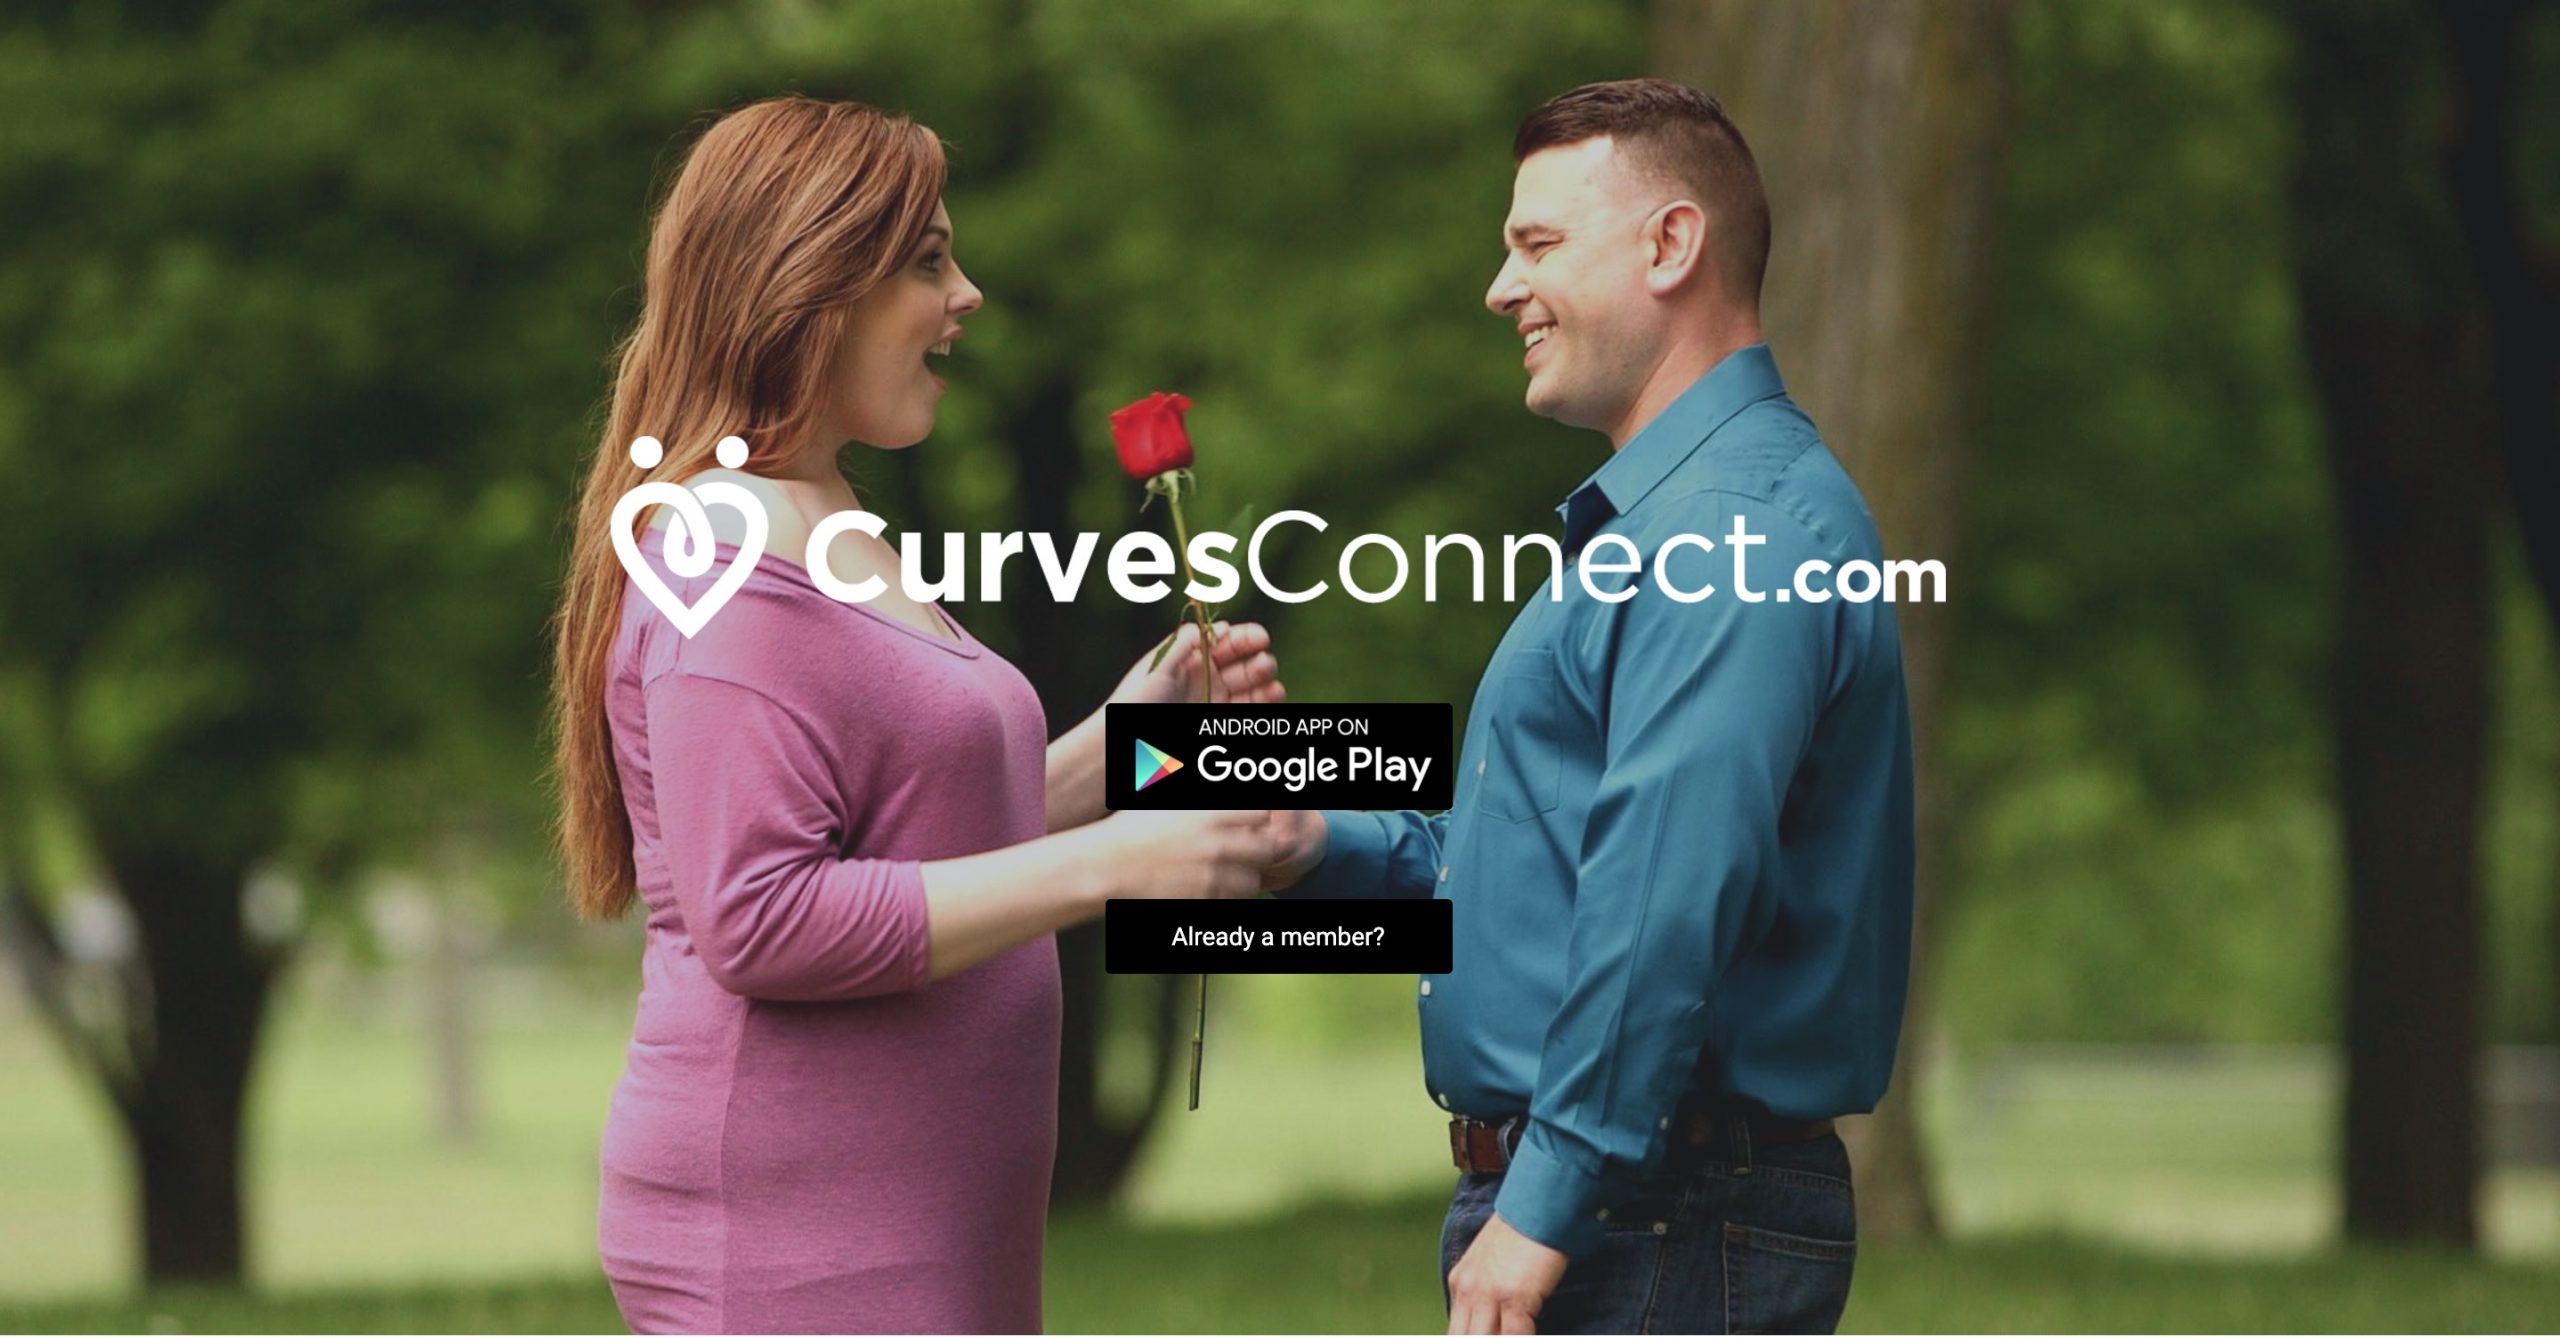 CurvesConnect app